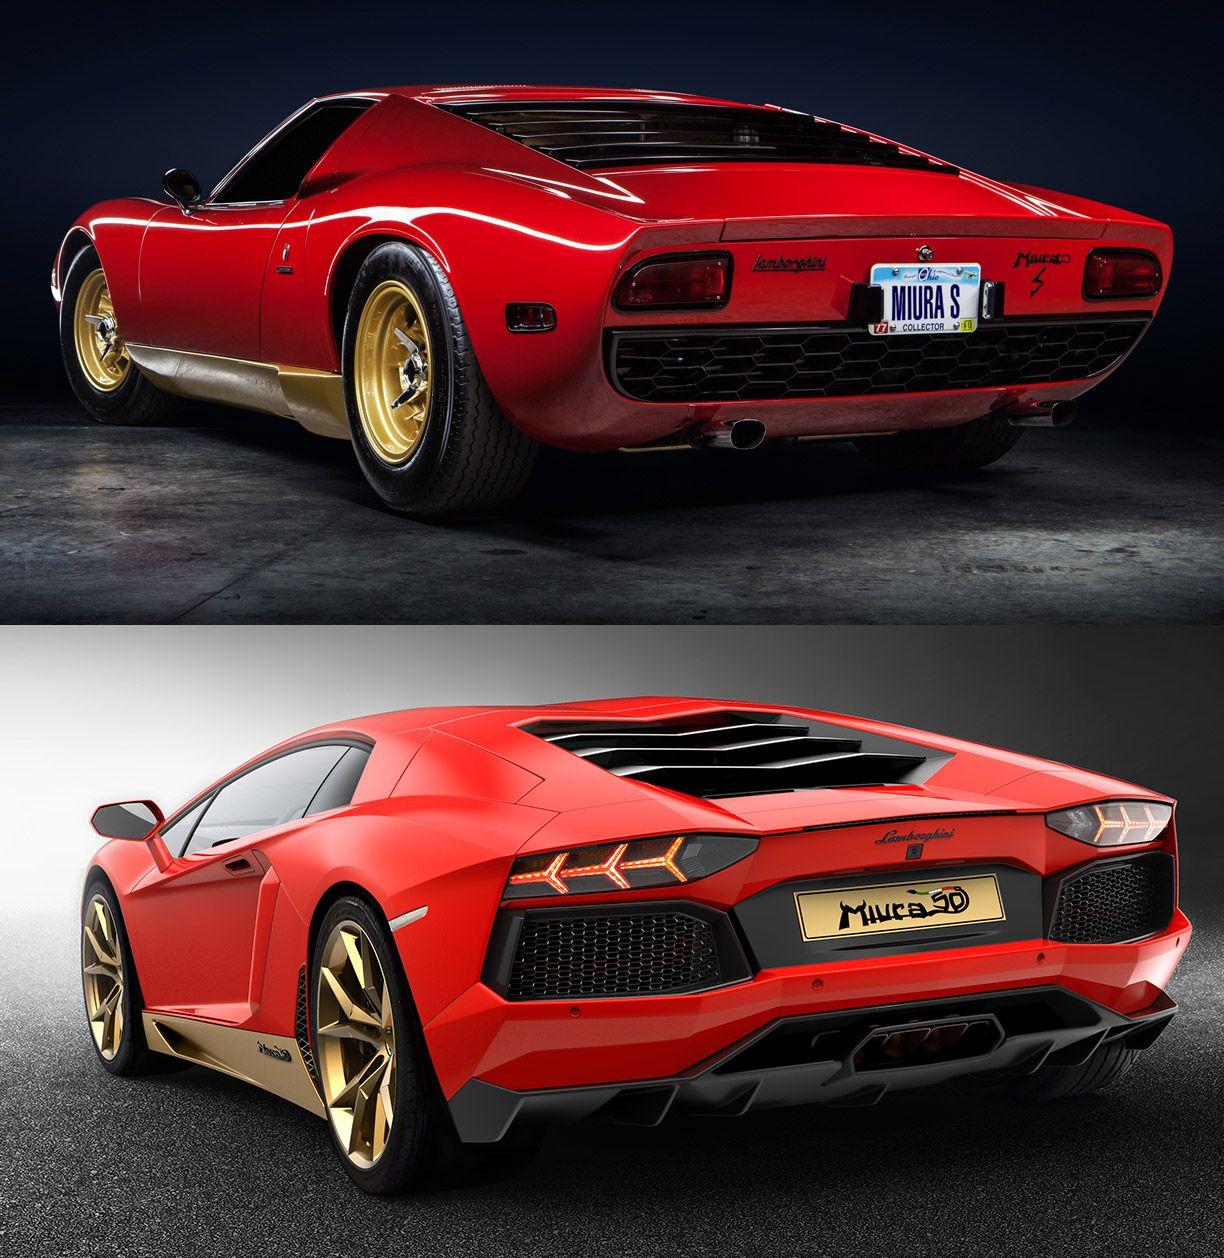 Good Lamborghini Miura Golden Anniversary With Special Edition Aventador Amazing Design